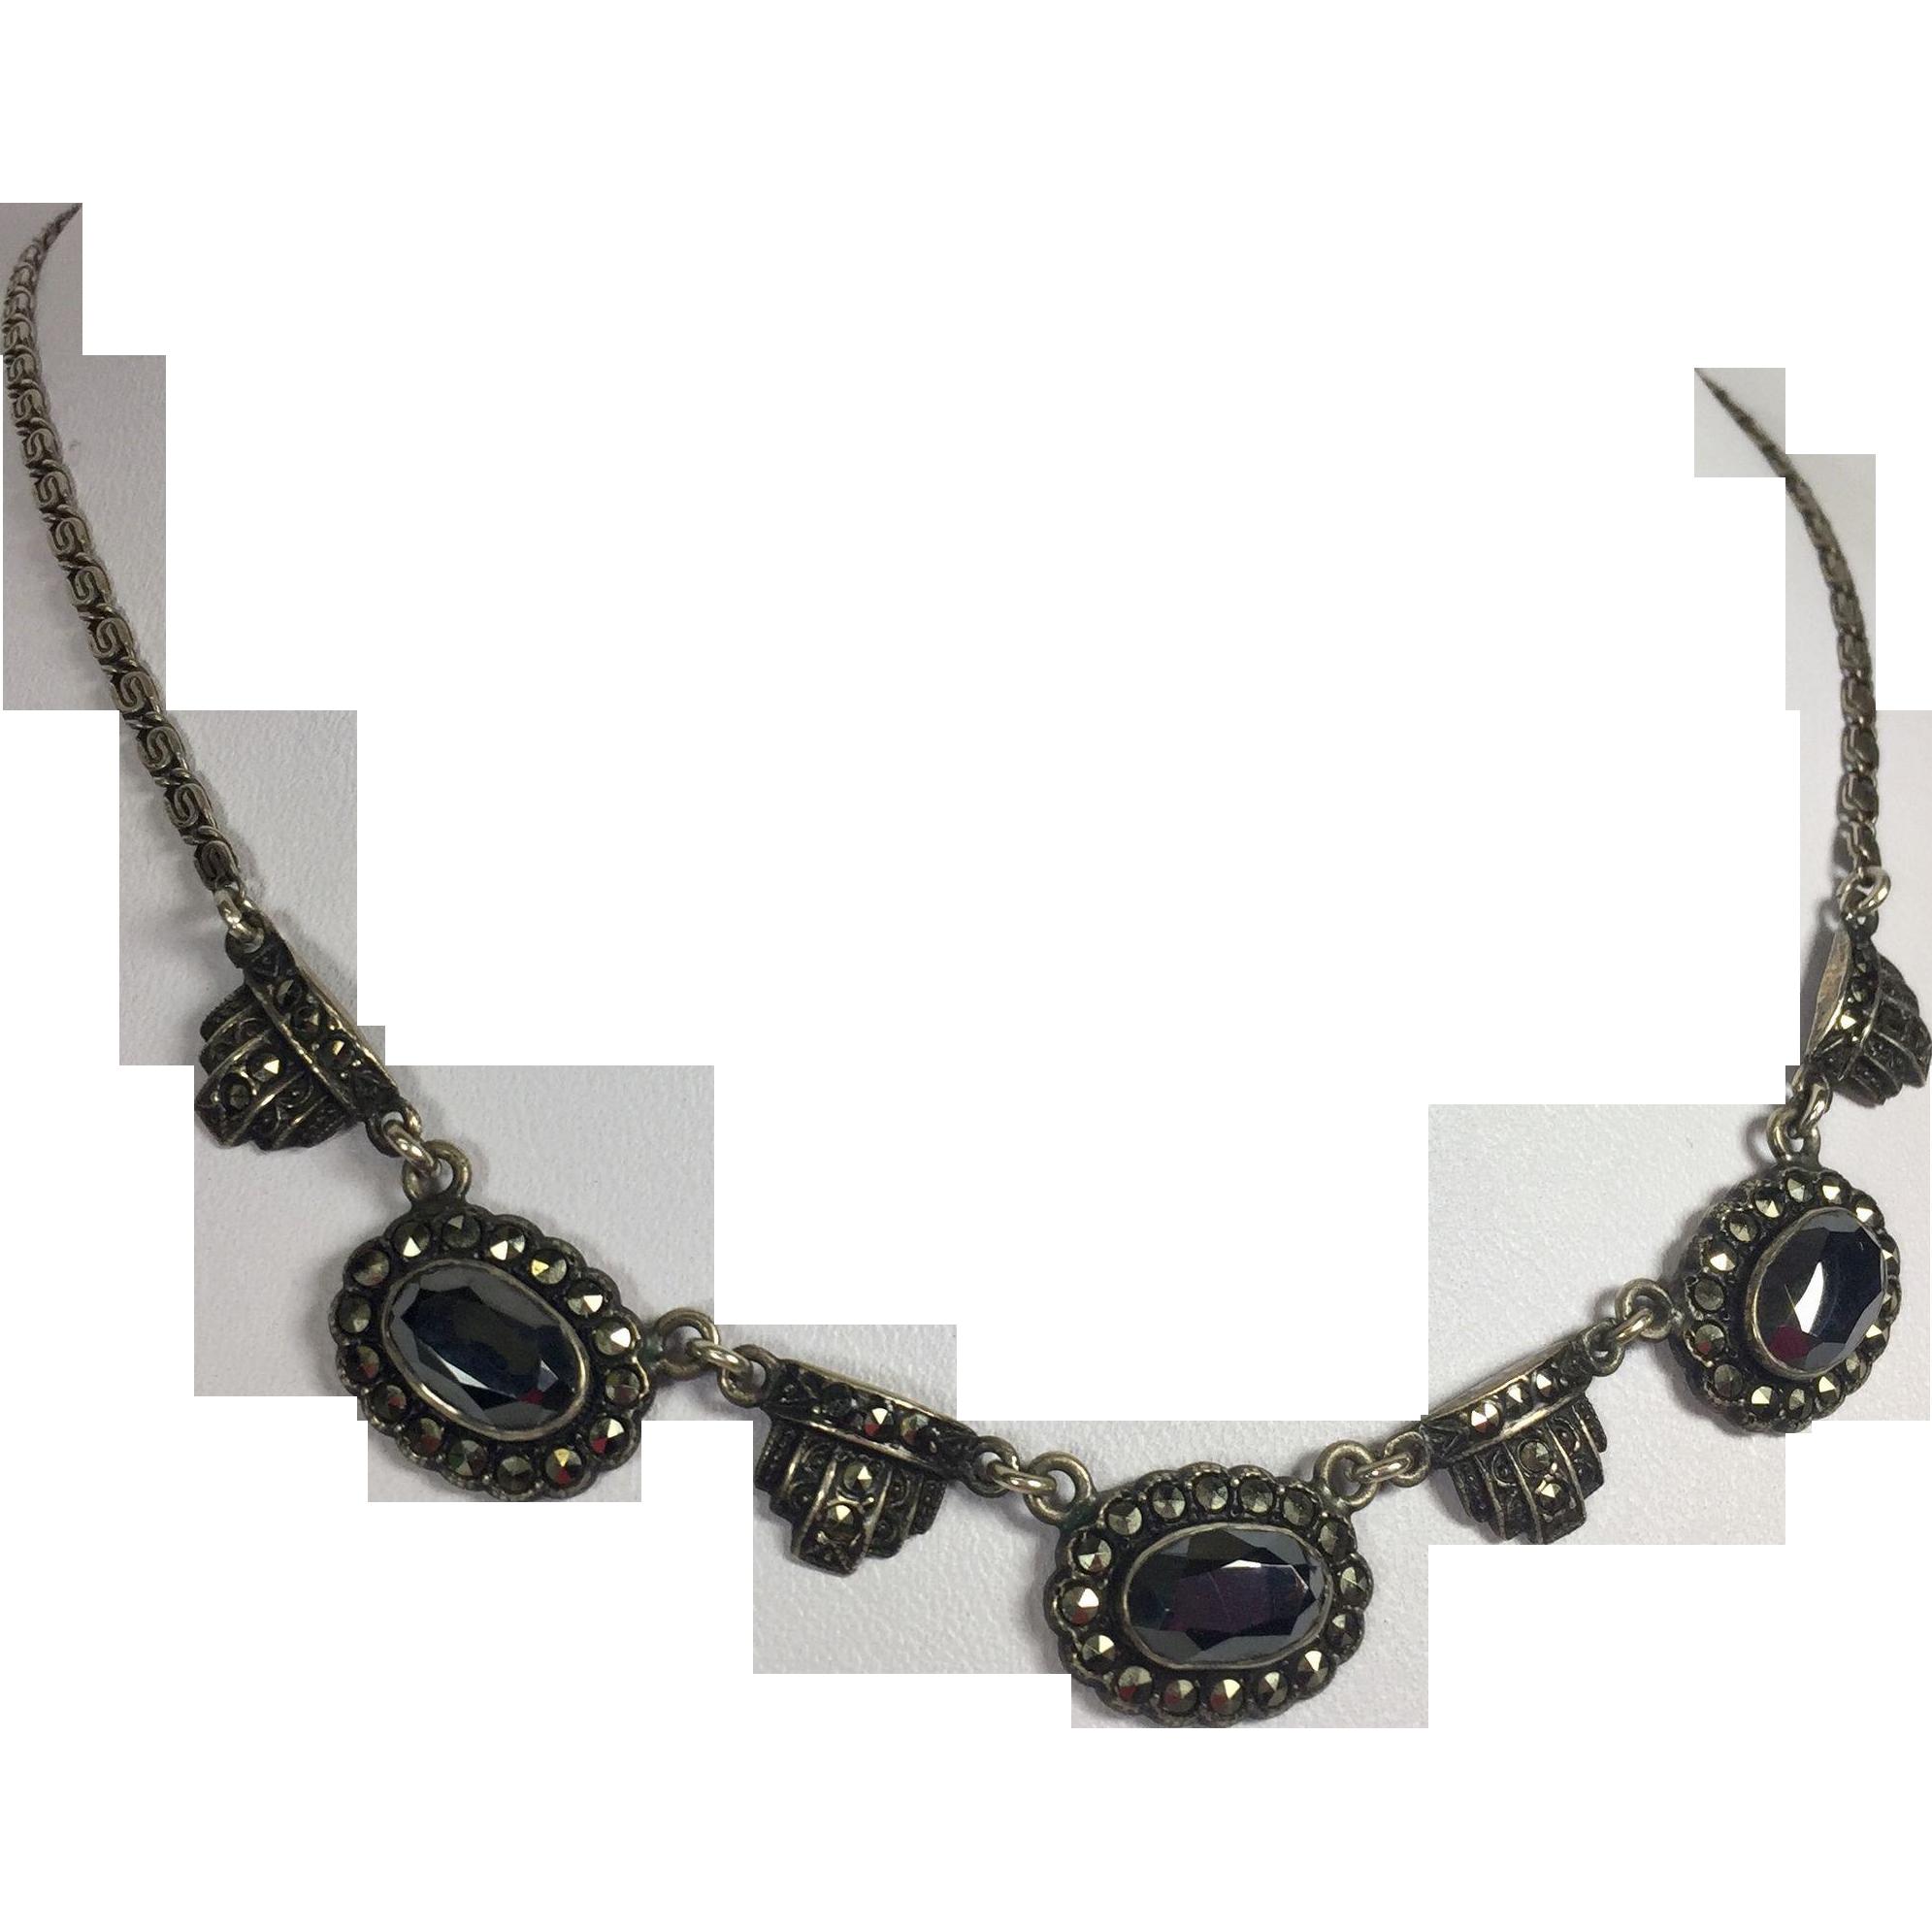 Art Deco Sterling Silver & Marcasite Necklace w Hematite Stones